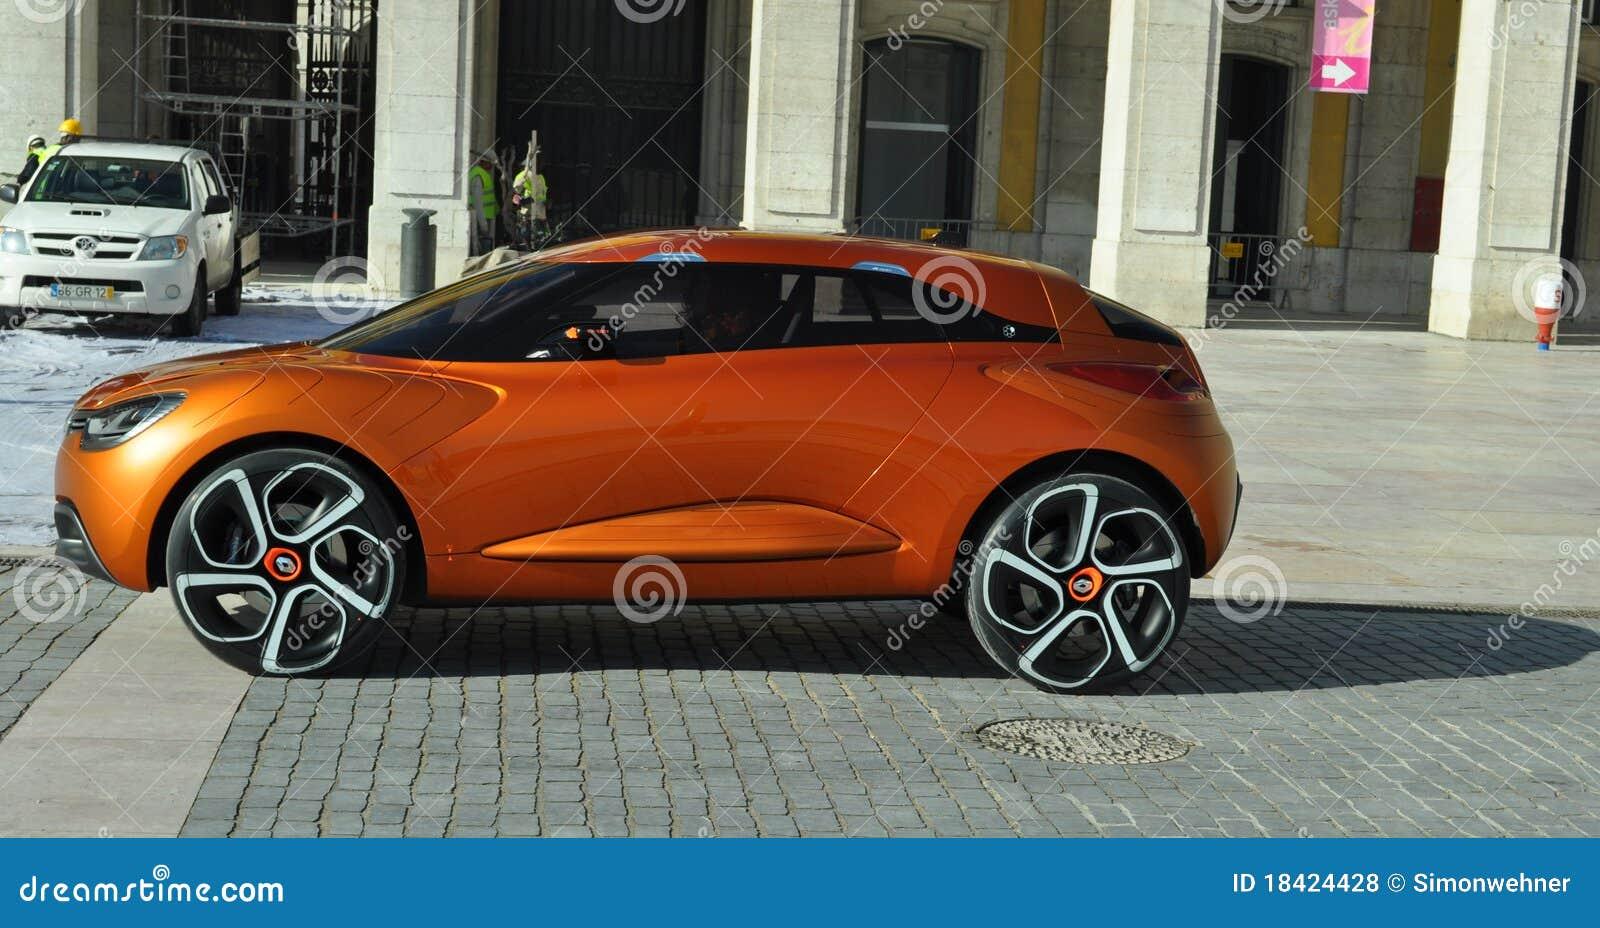 Kondaspeter: Renault Future Car, Concept Car